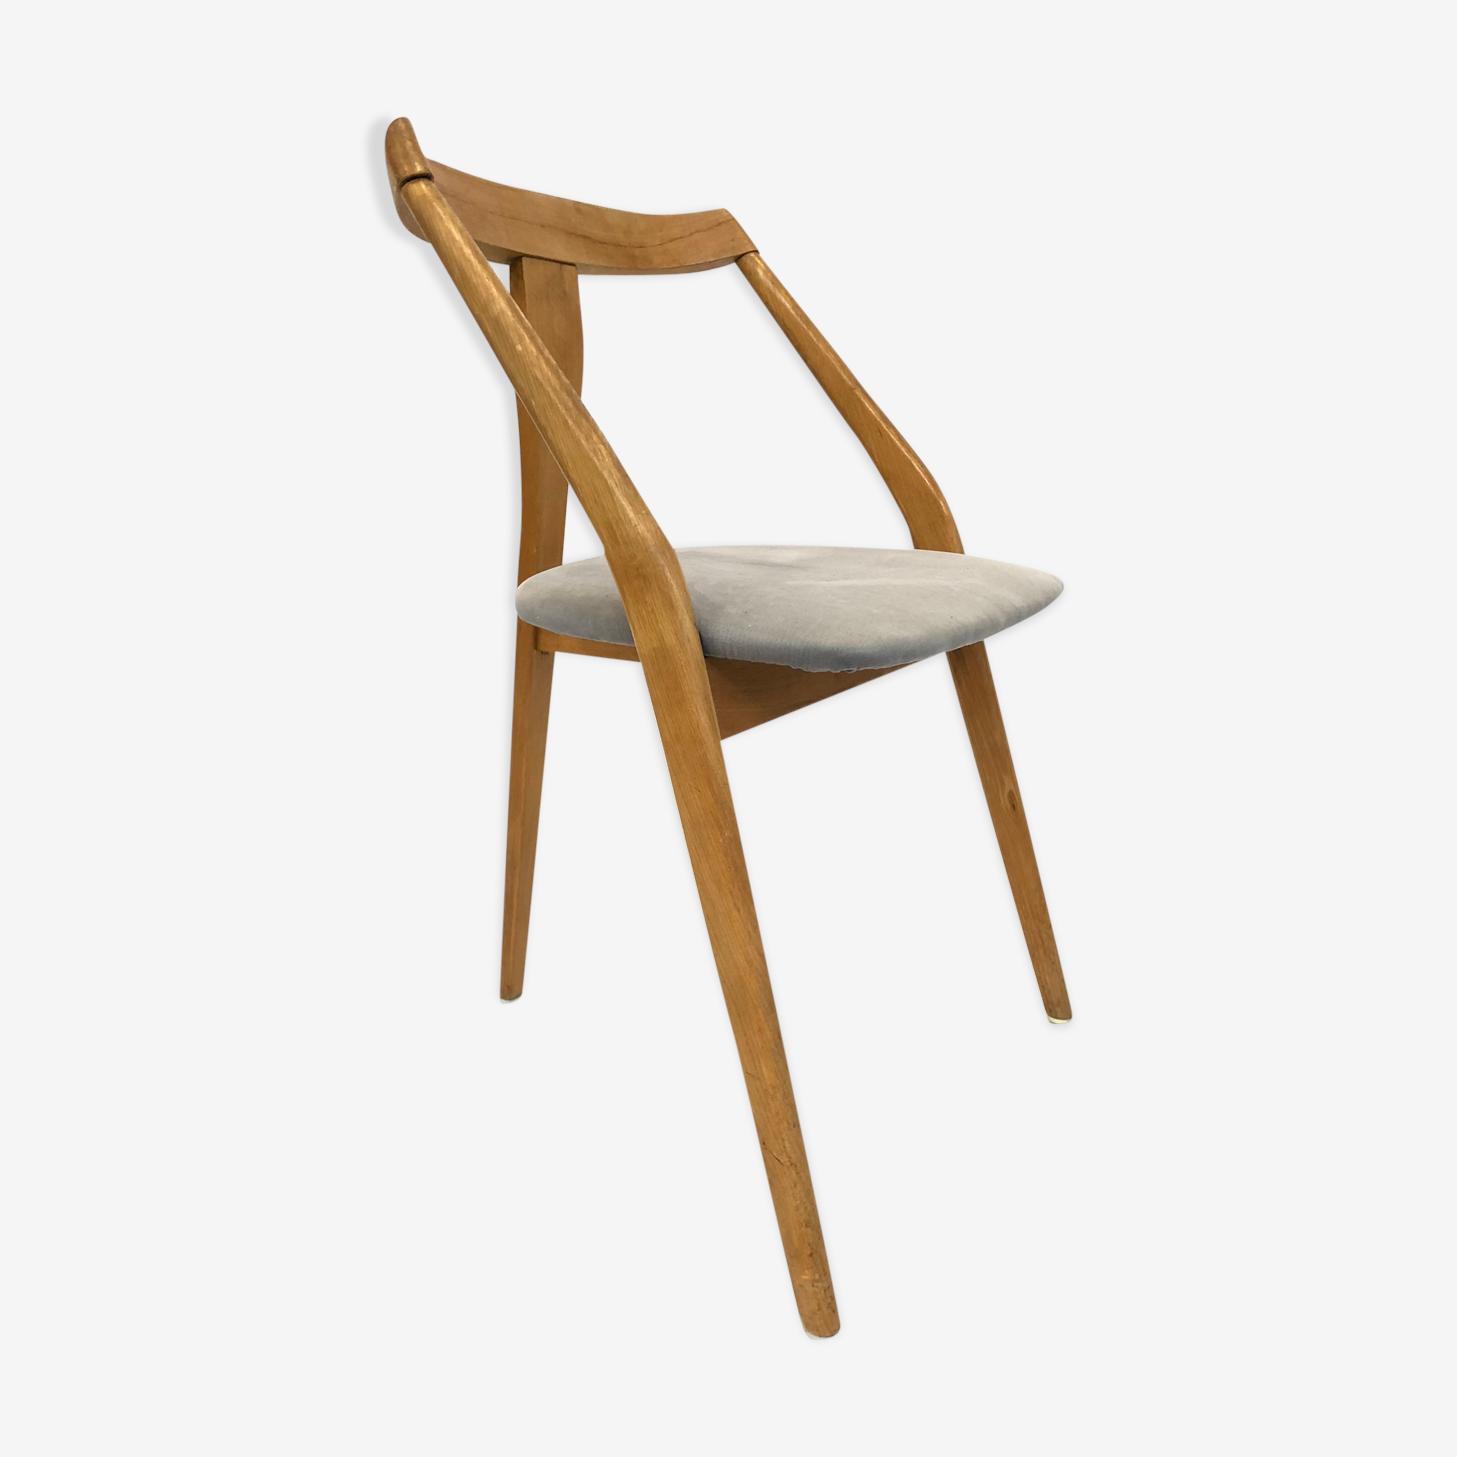 Dining room chair design vintage Danish Design 60 s-70 s